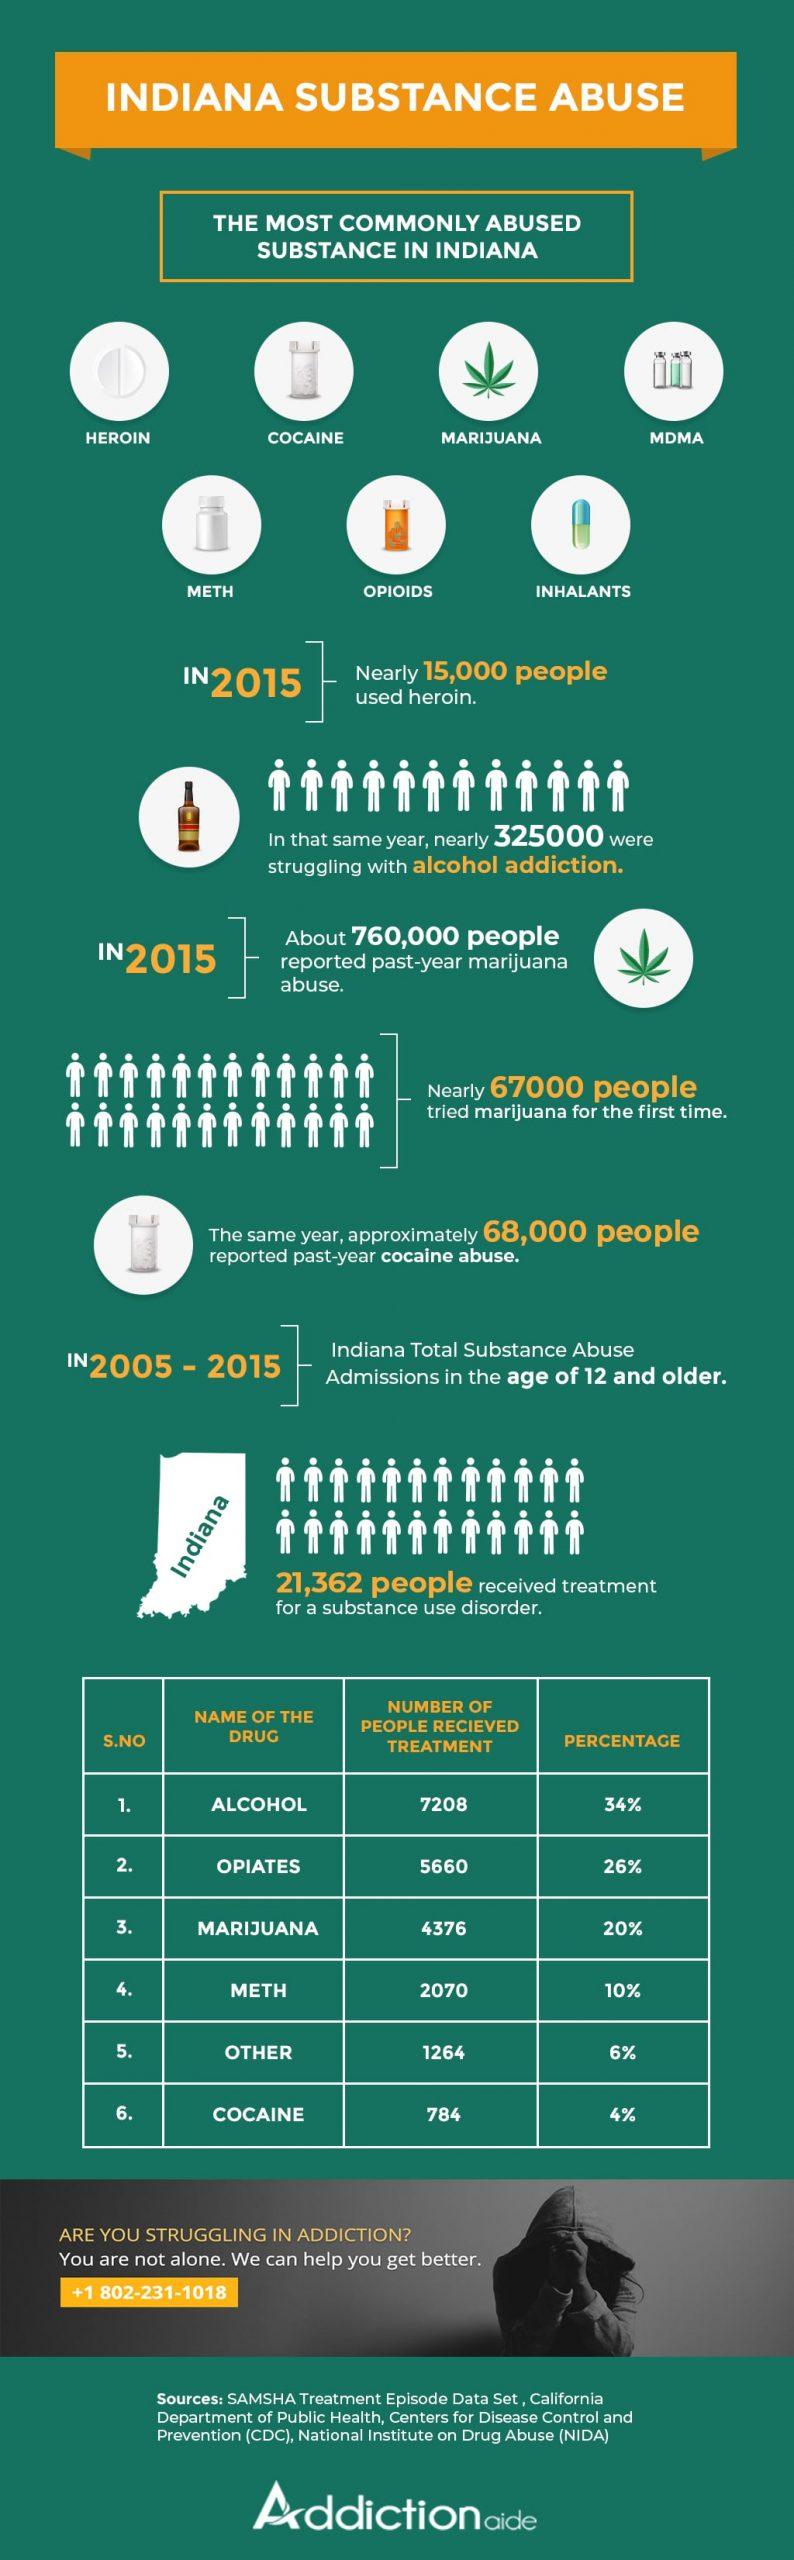 Indiana substance abuse